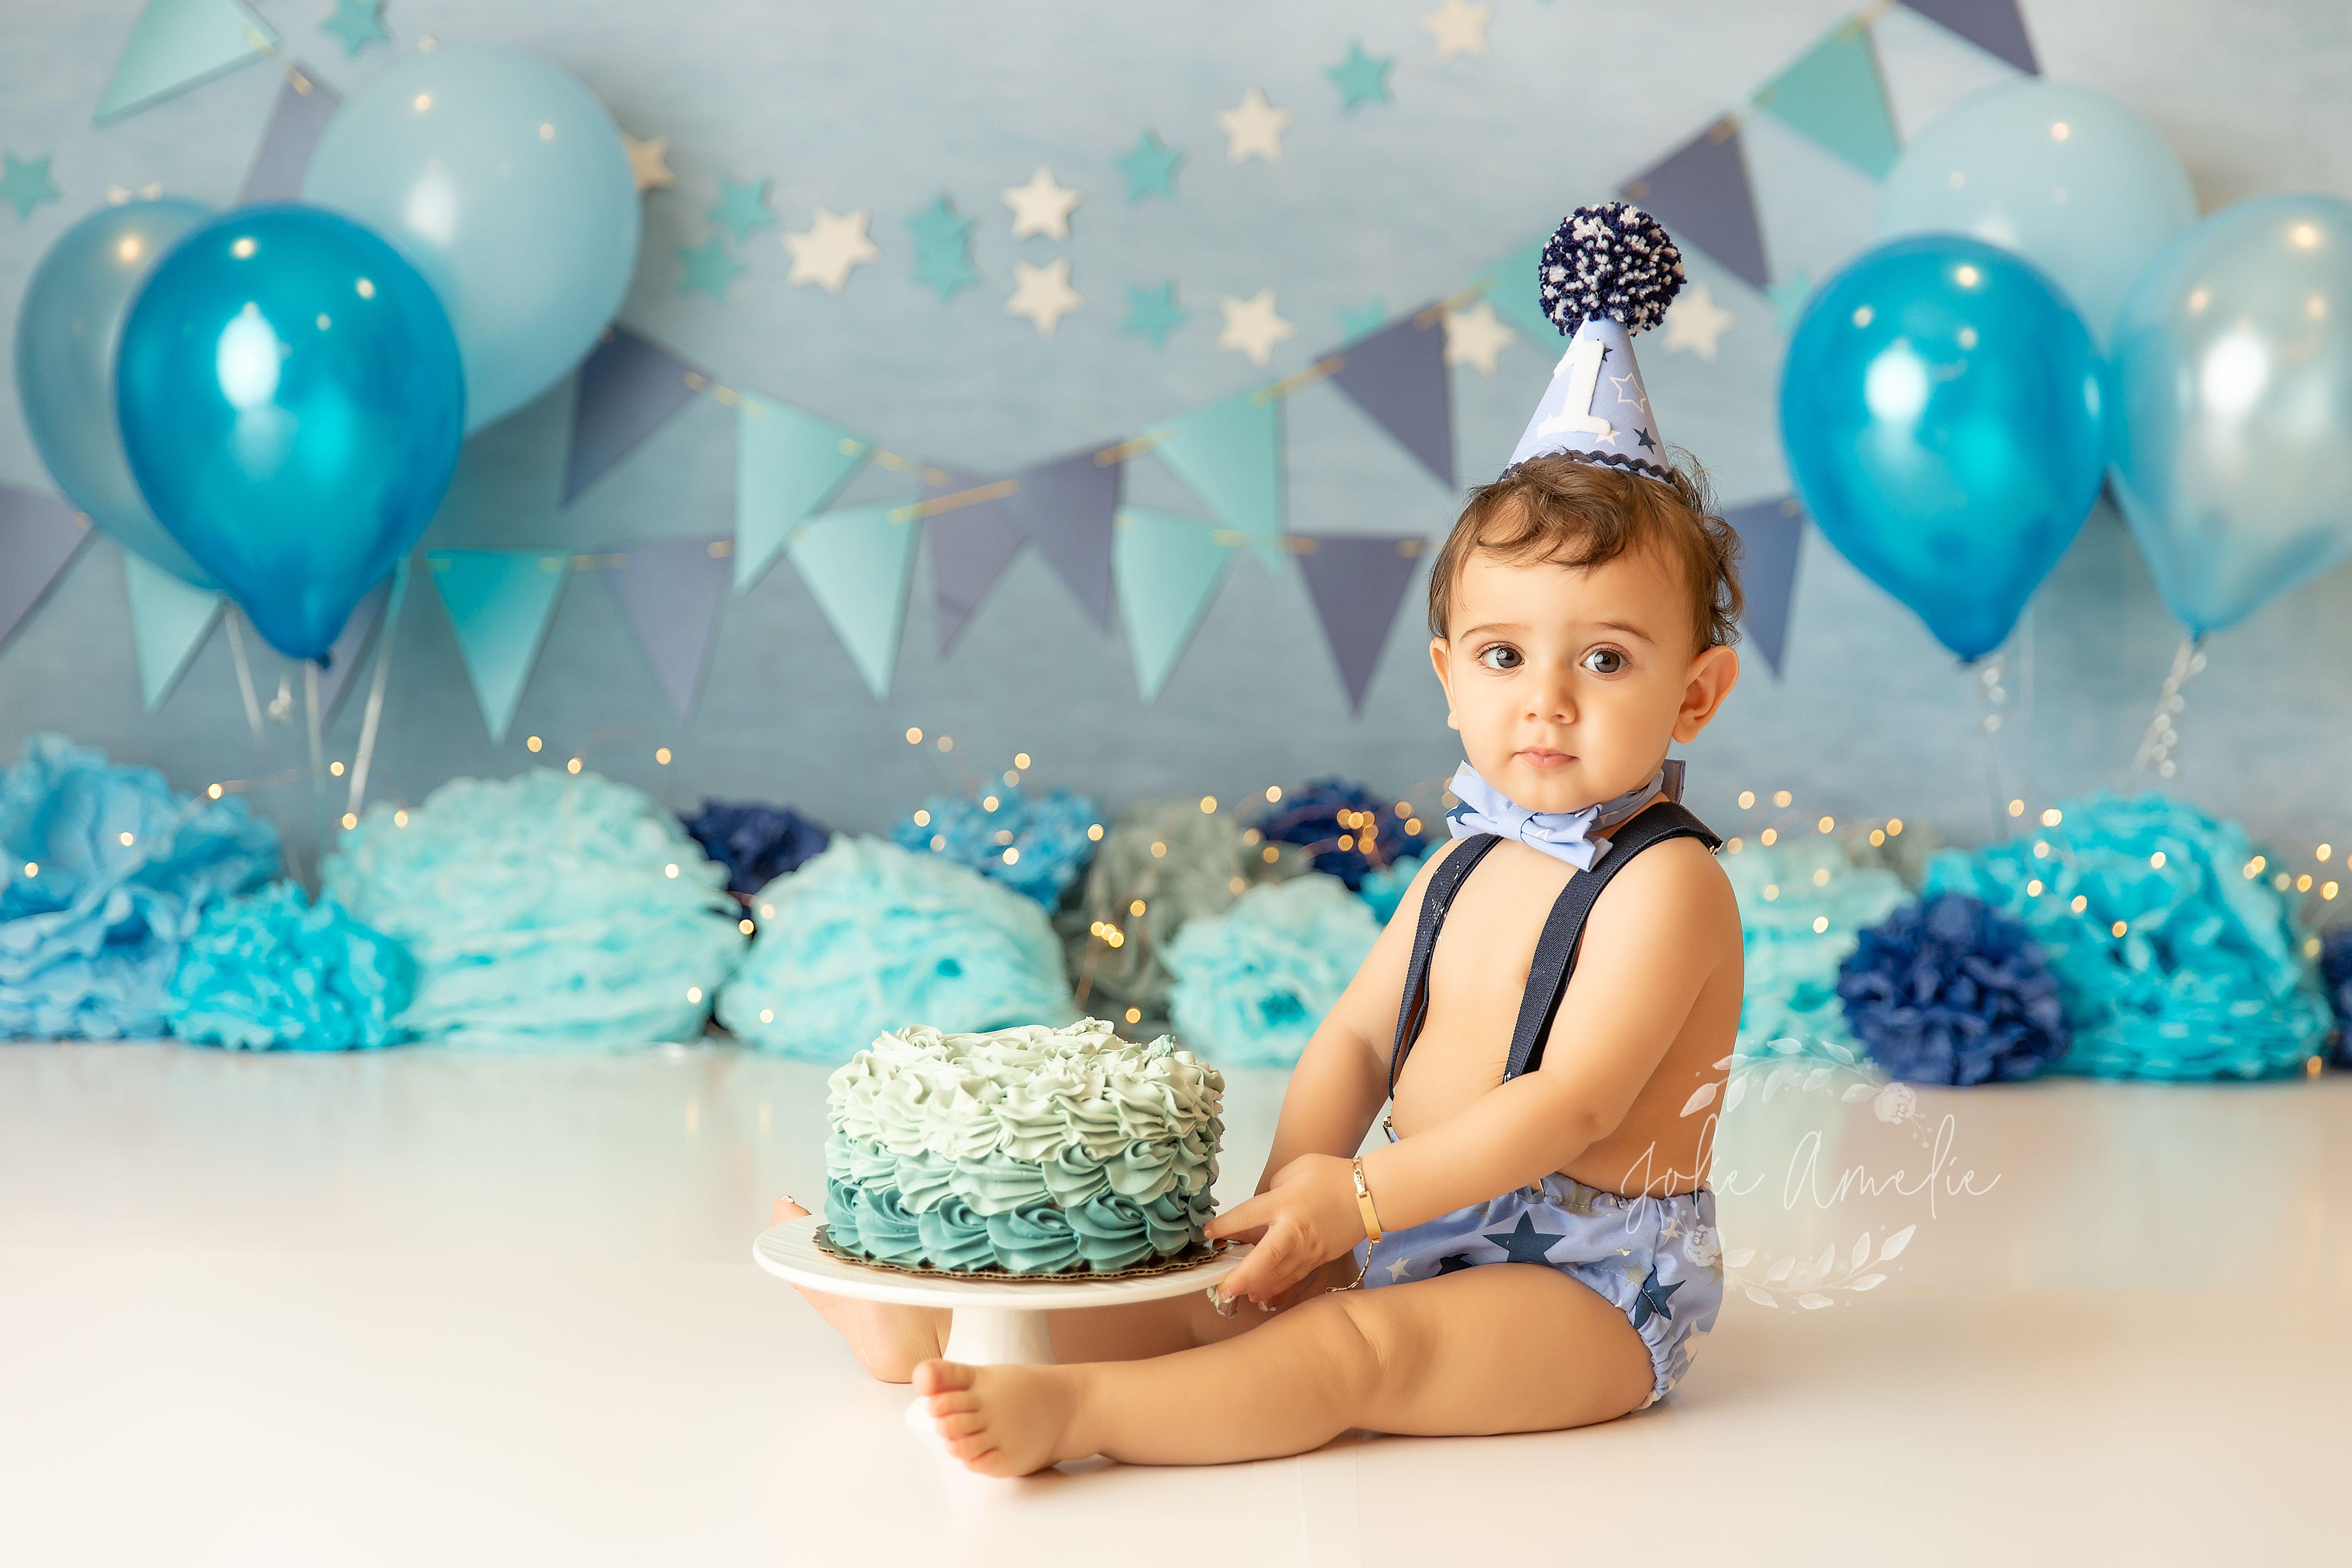 Pin On Cake Smash Jolie Amelie Photography